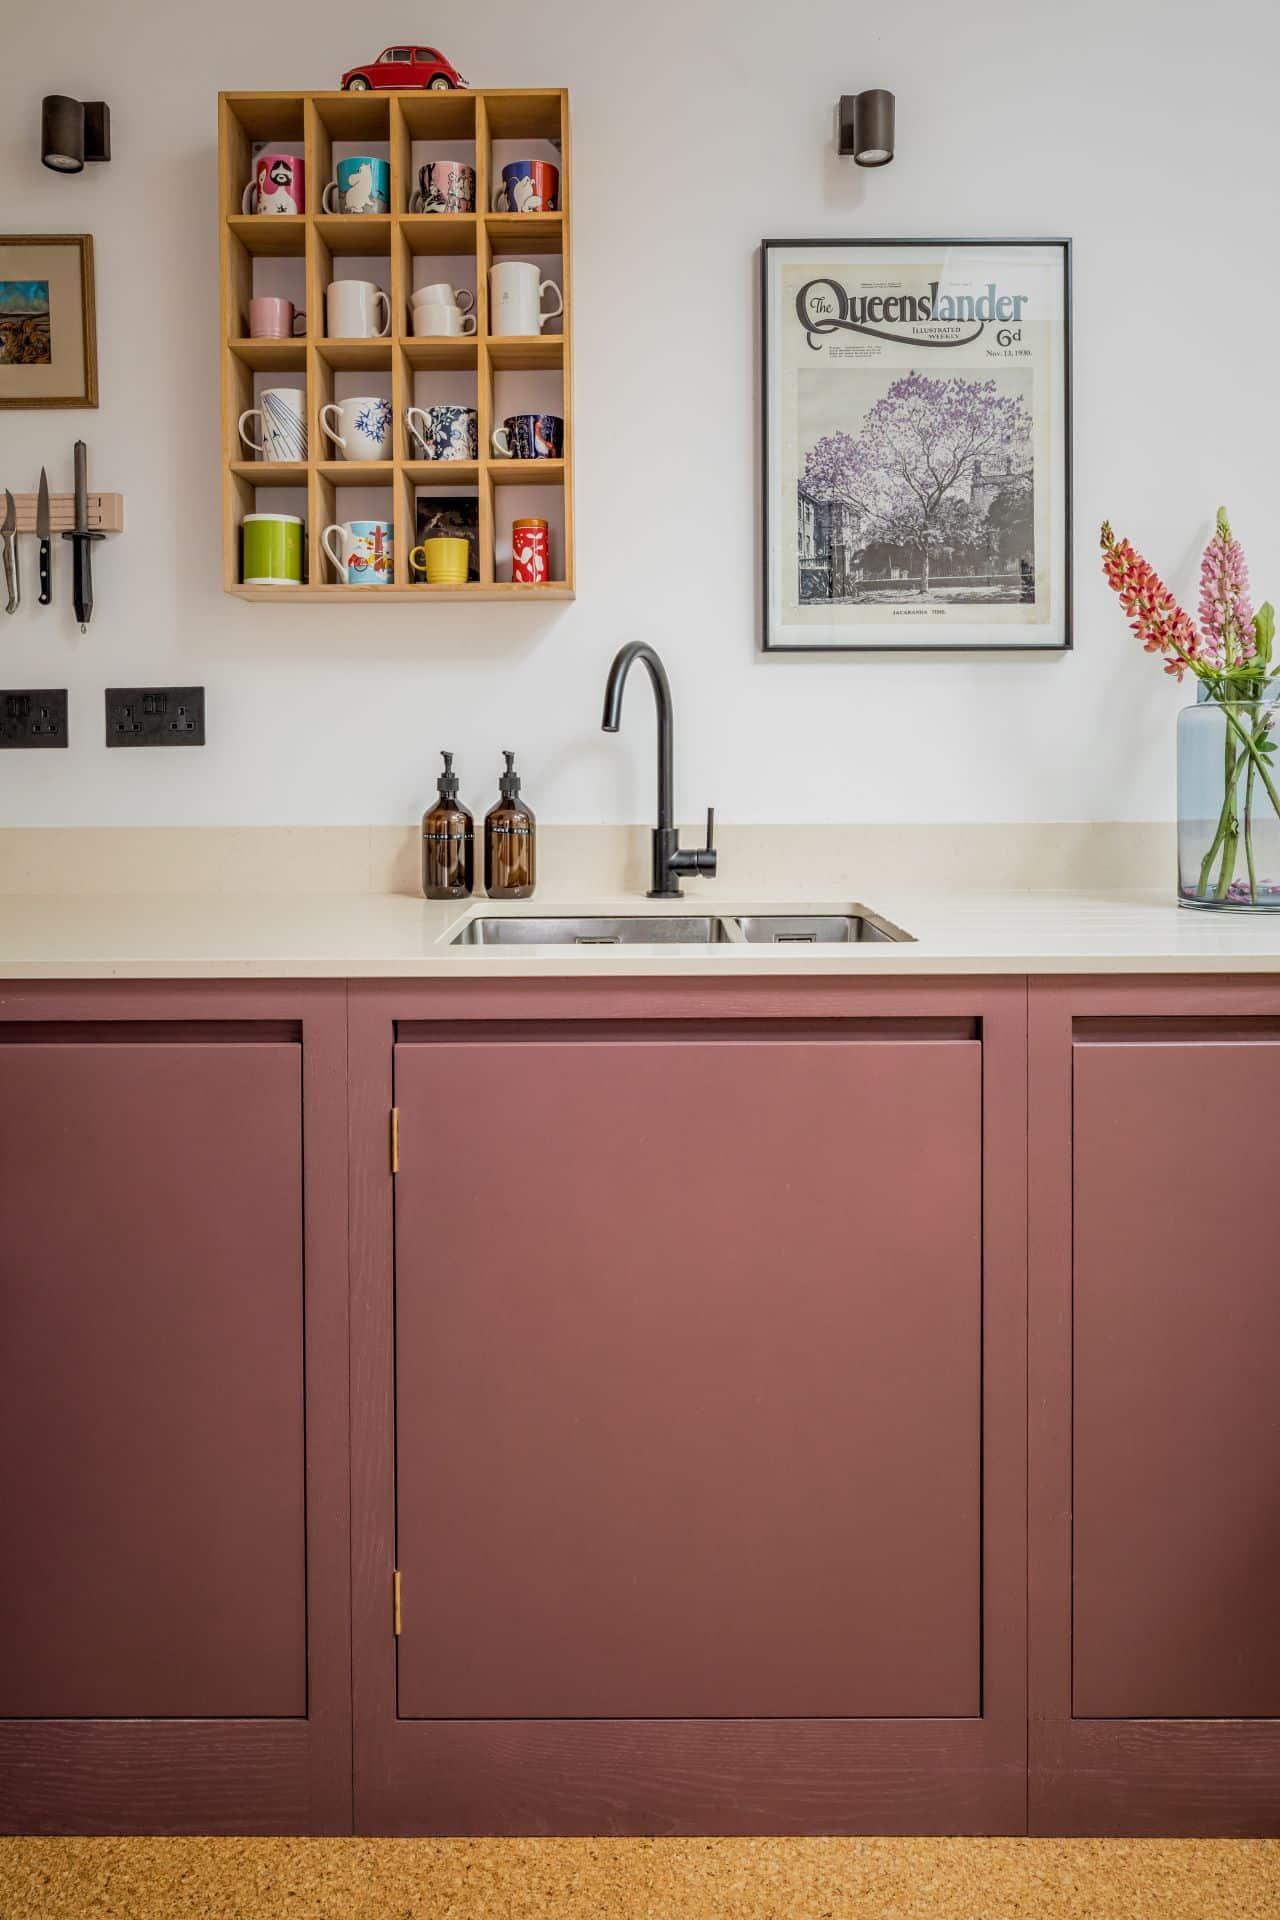 Honest Kitchens flat panel kitchen with quartz stone culture worktop and cork flooring